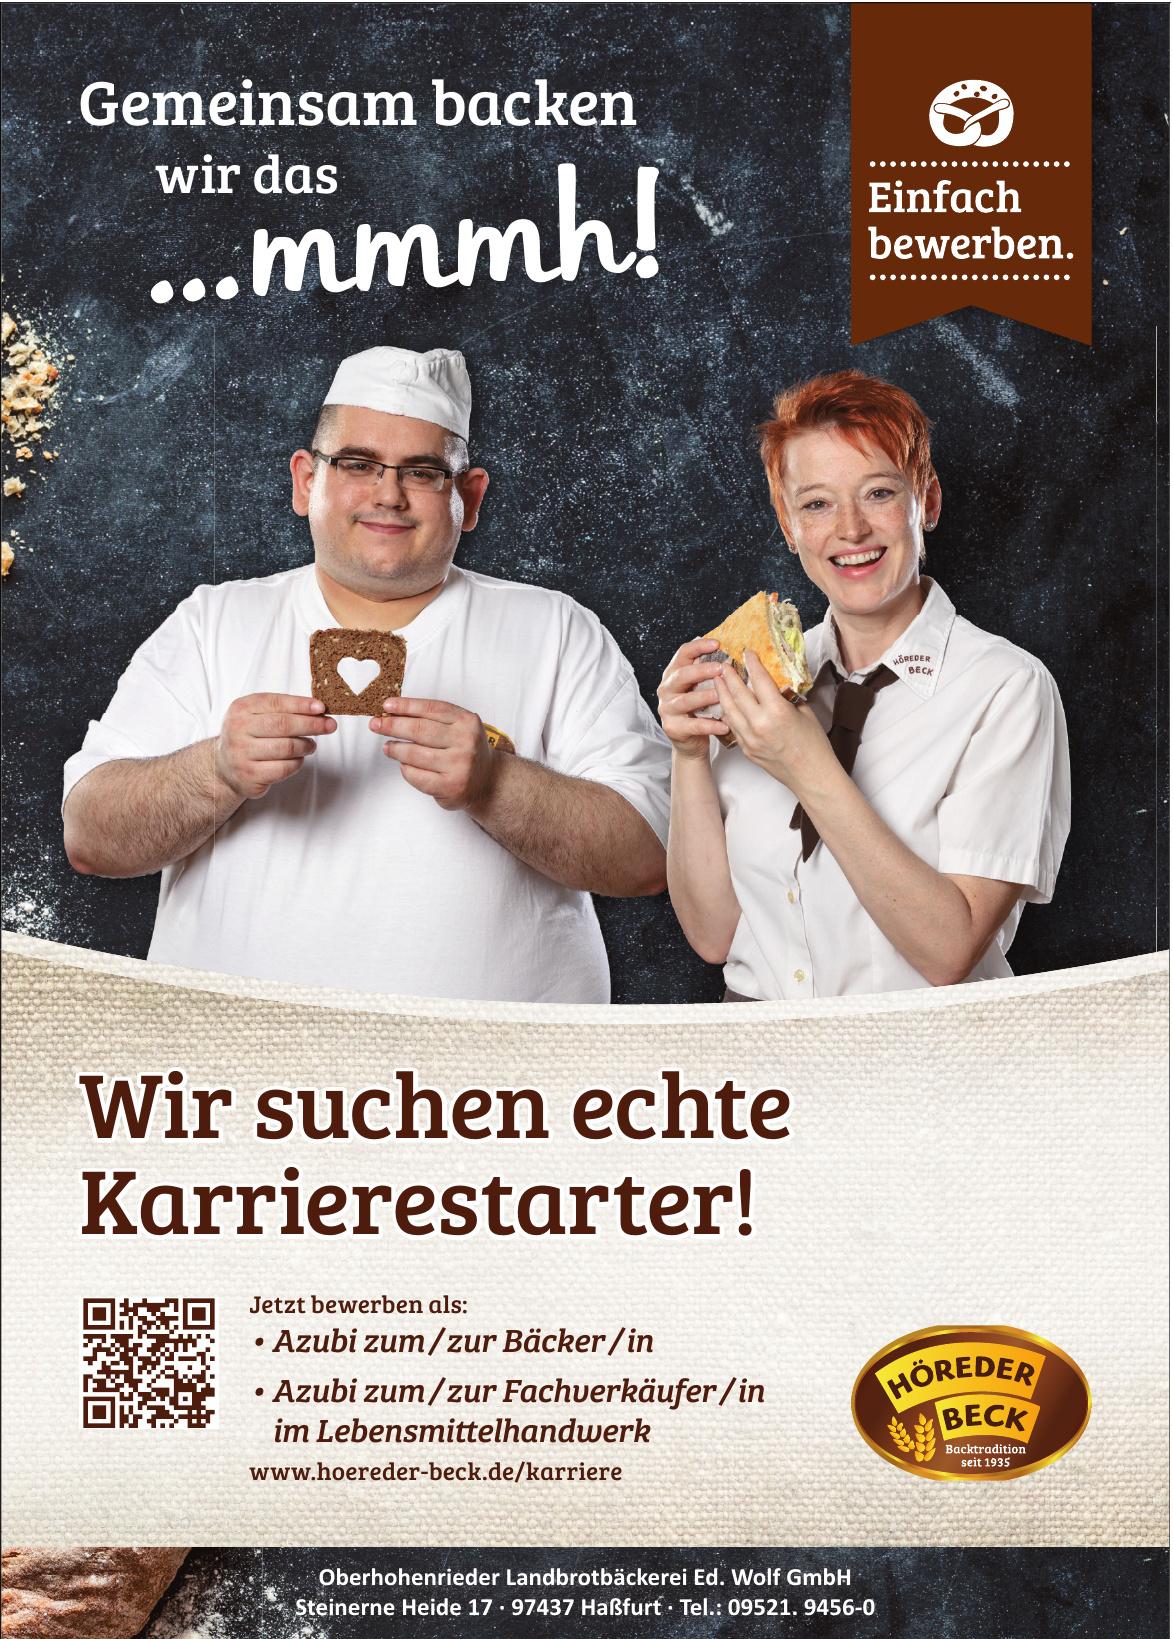 Oberhohenrieder Landbrotbäckerei Ed. Wolf GmbH